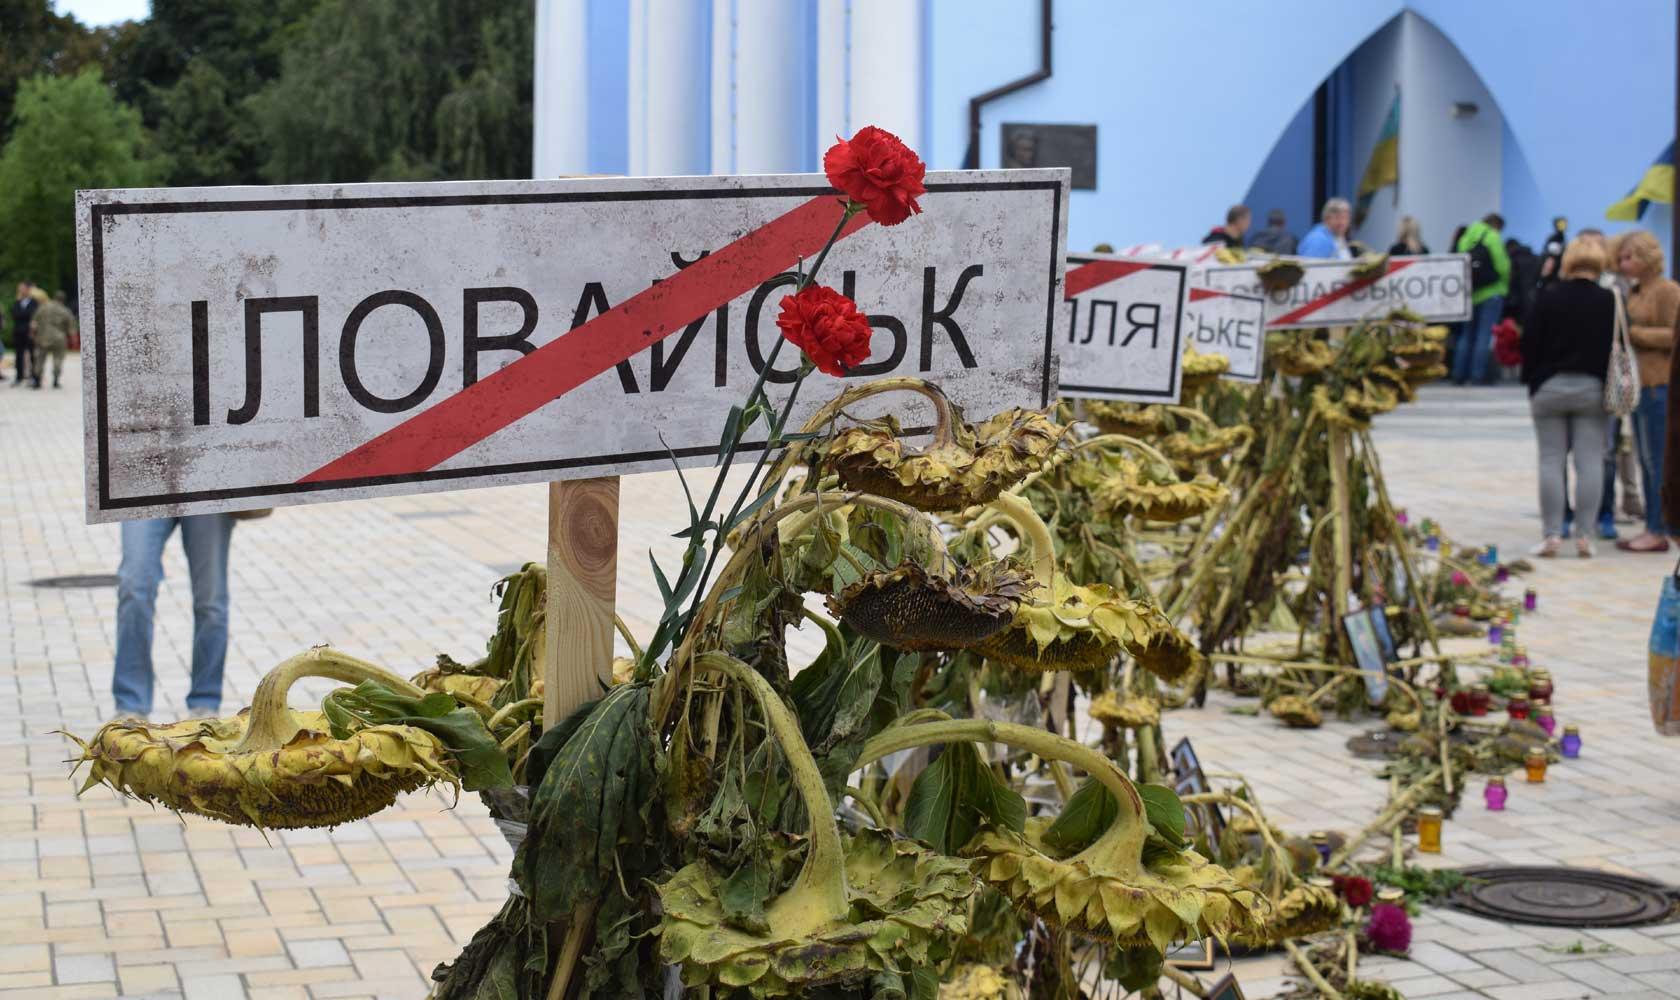 ilovajsk-1.jpg